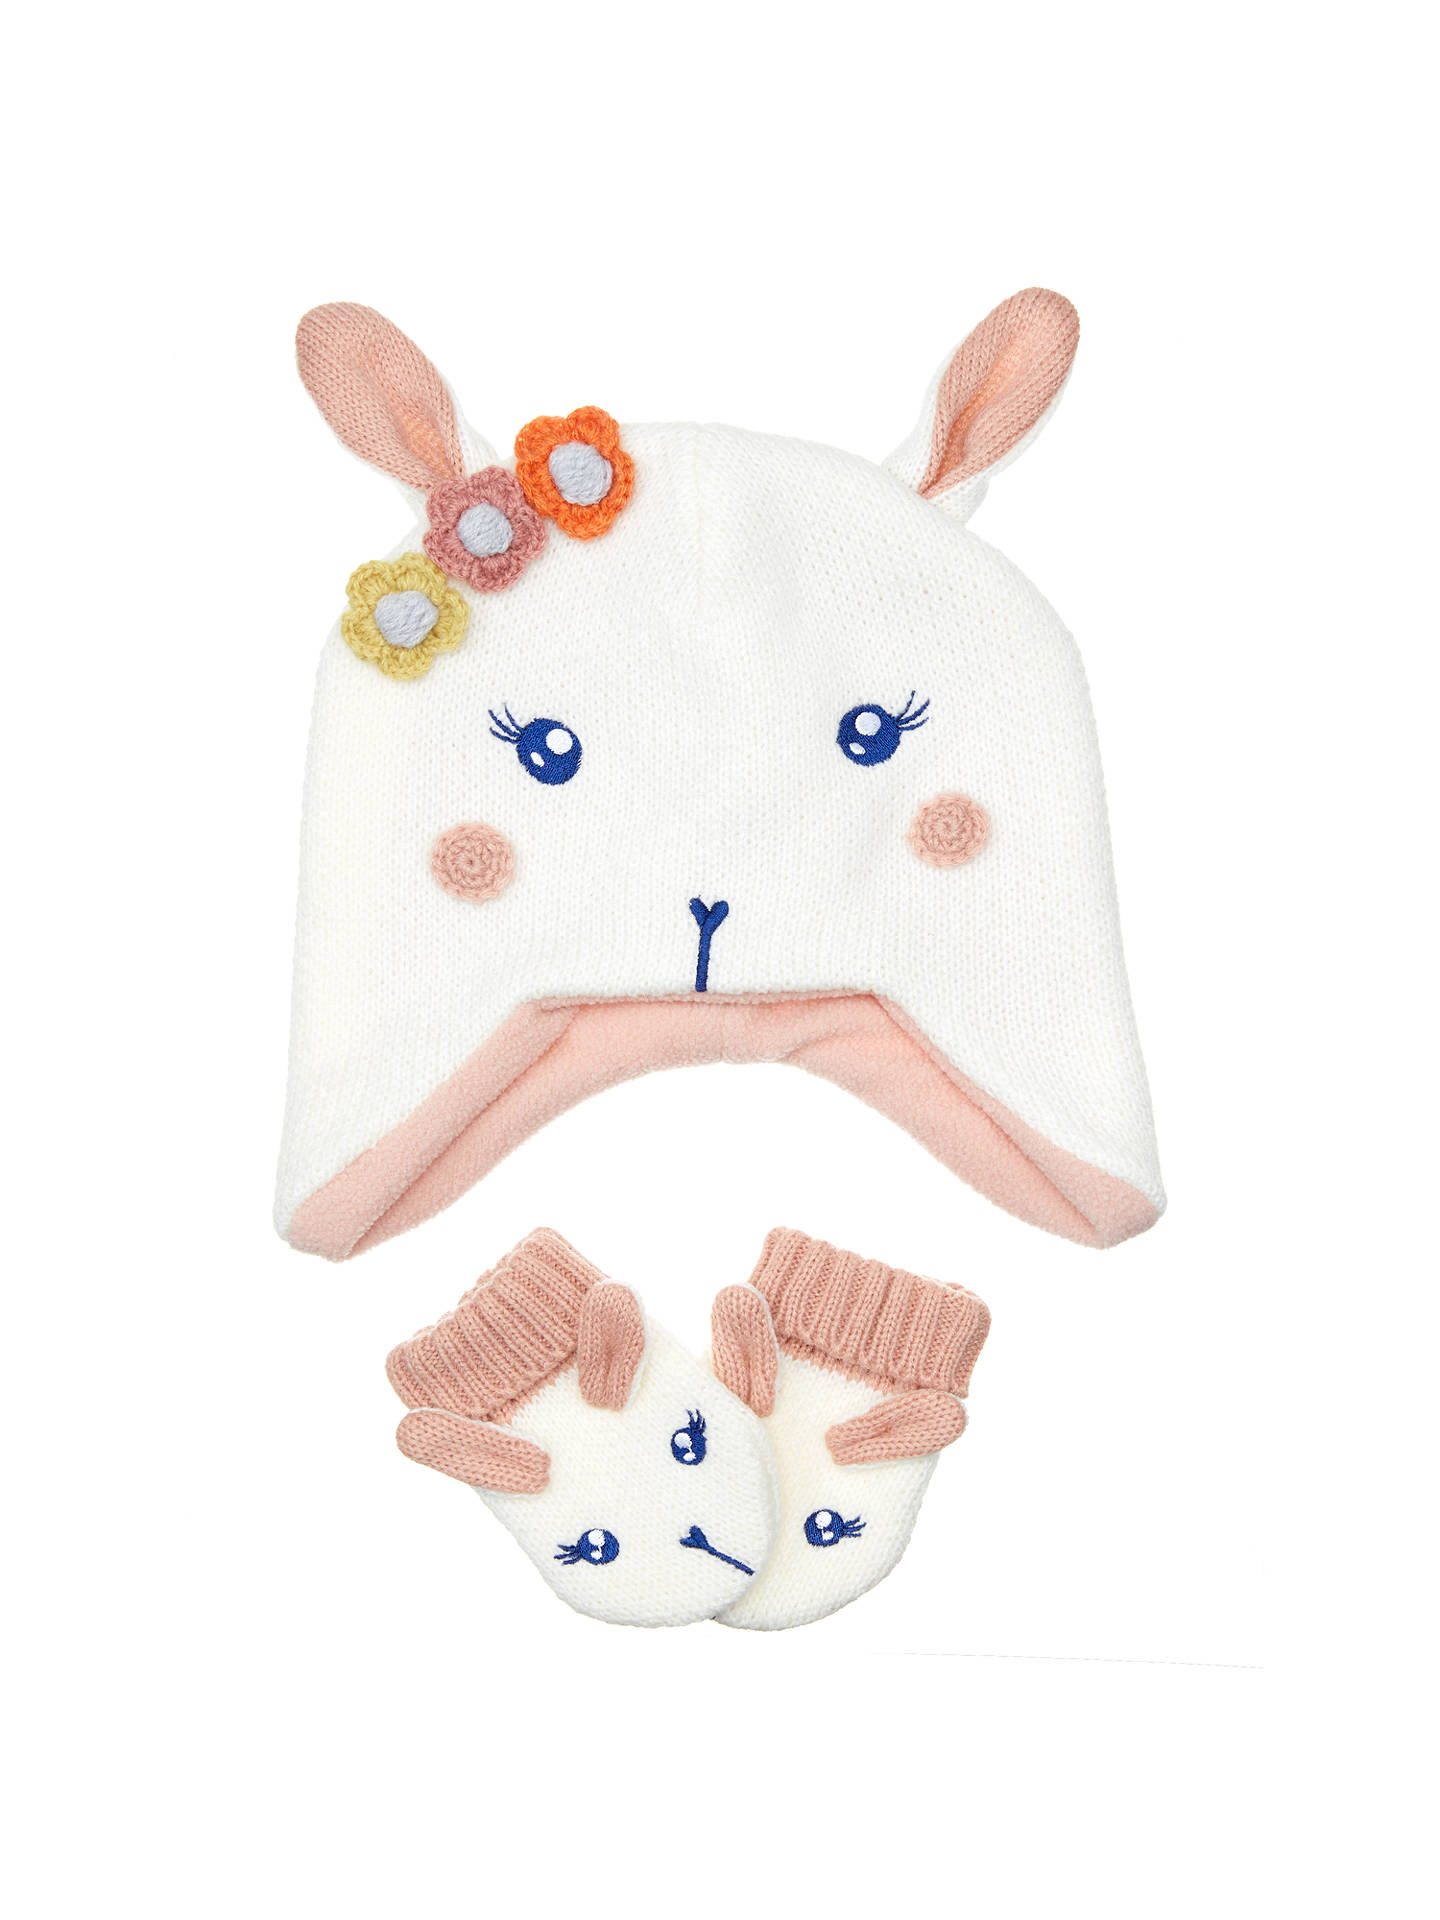 2f6054abc6003 Buy John Lewis Baby Bunny Hat and Glove Set